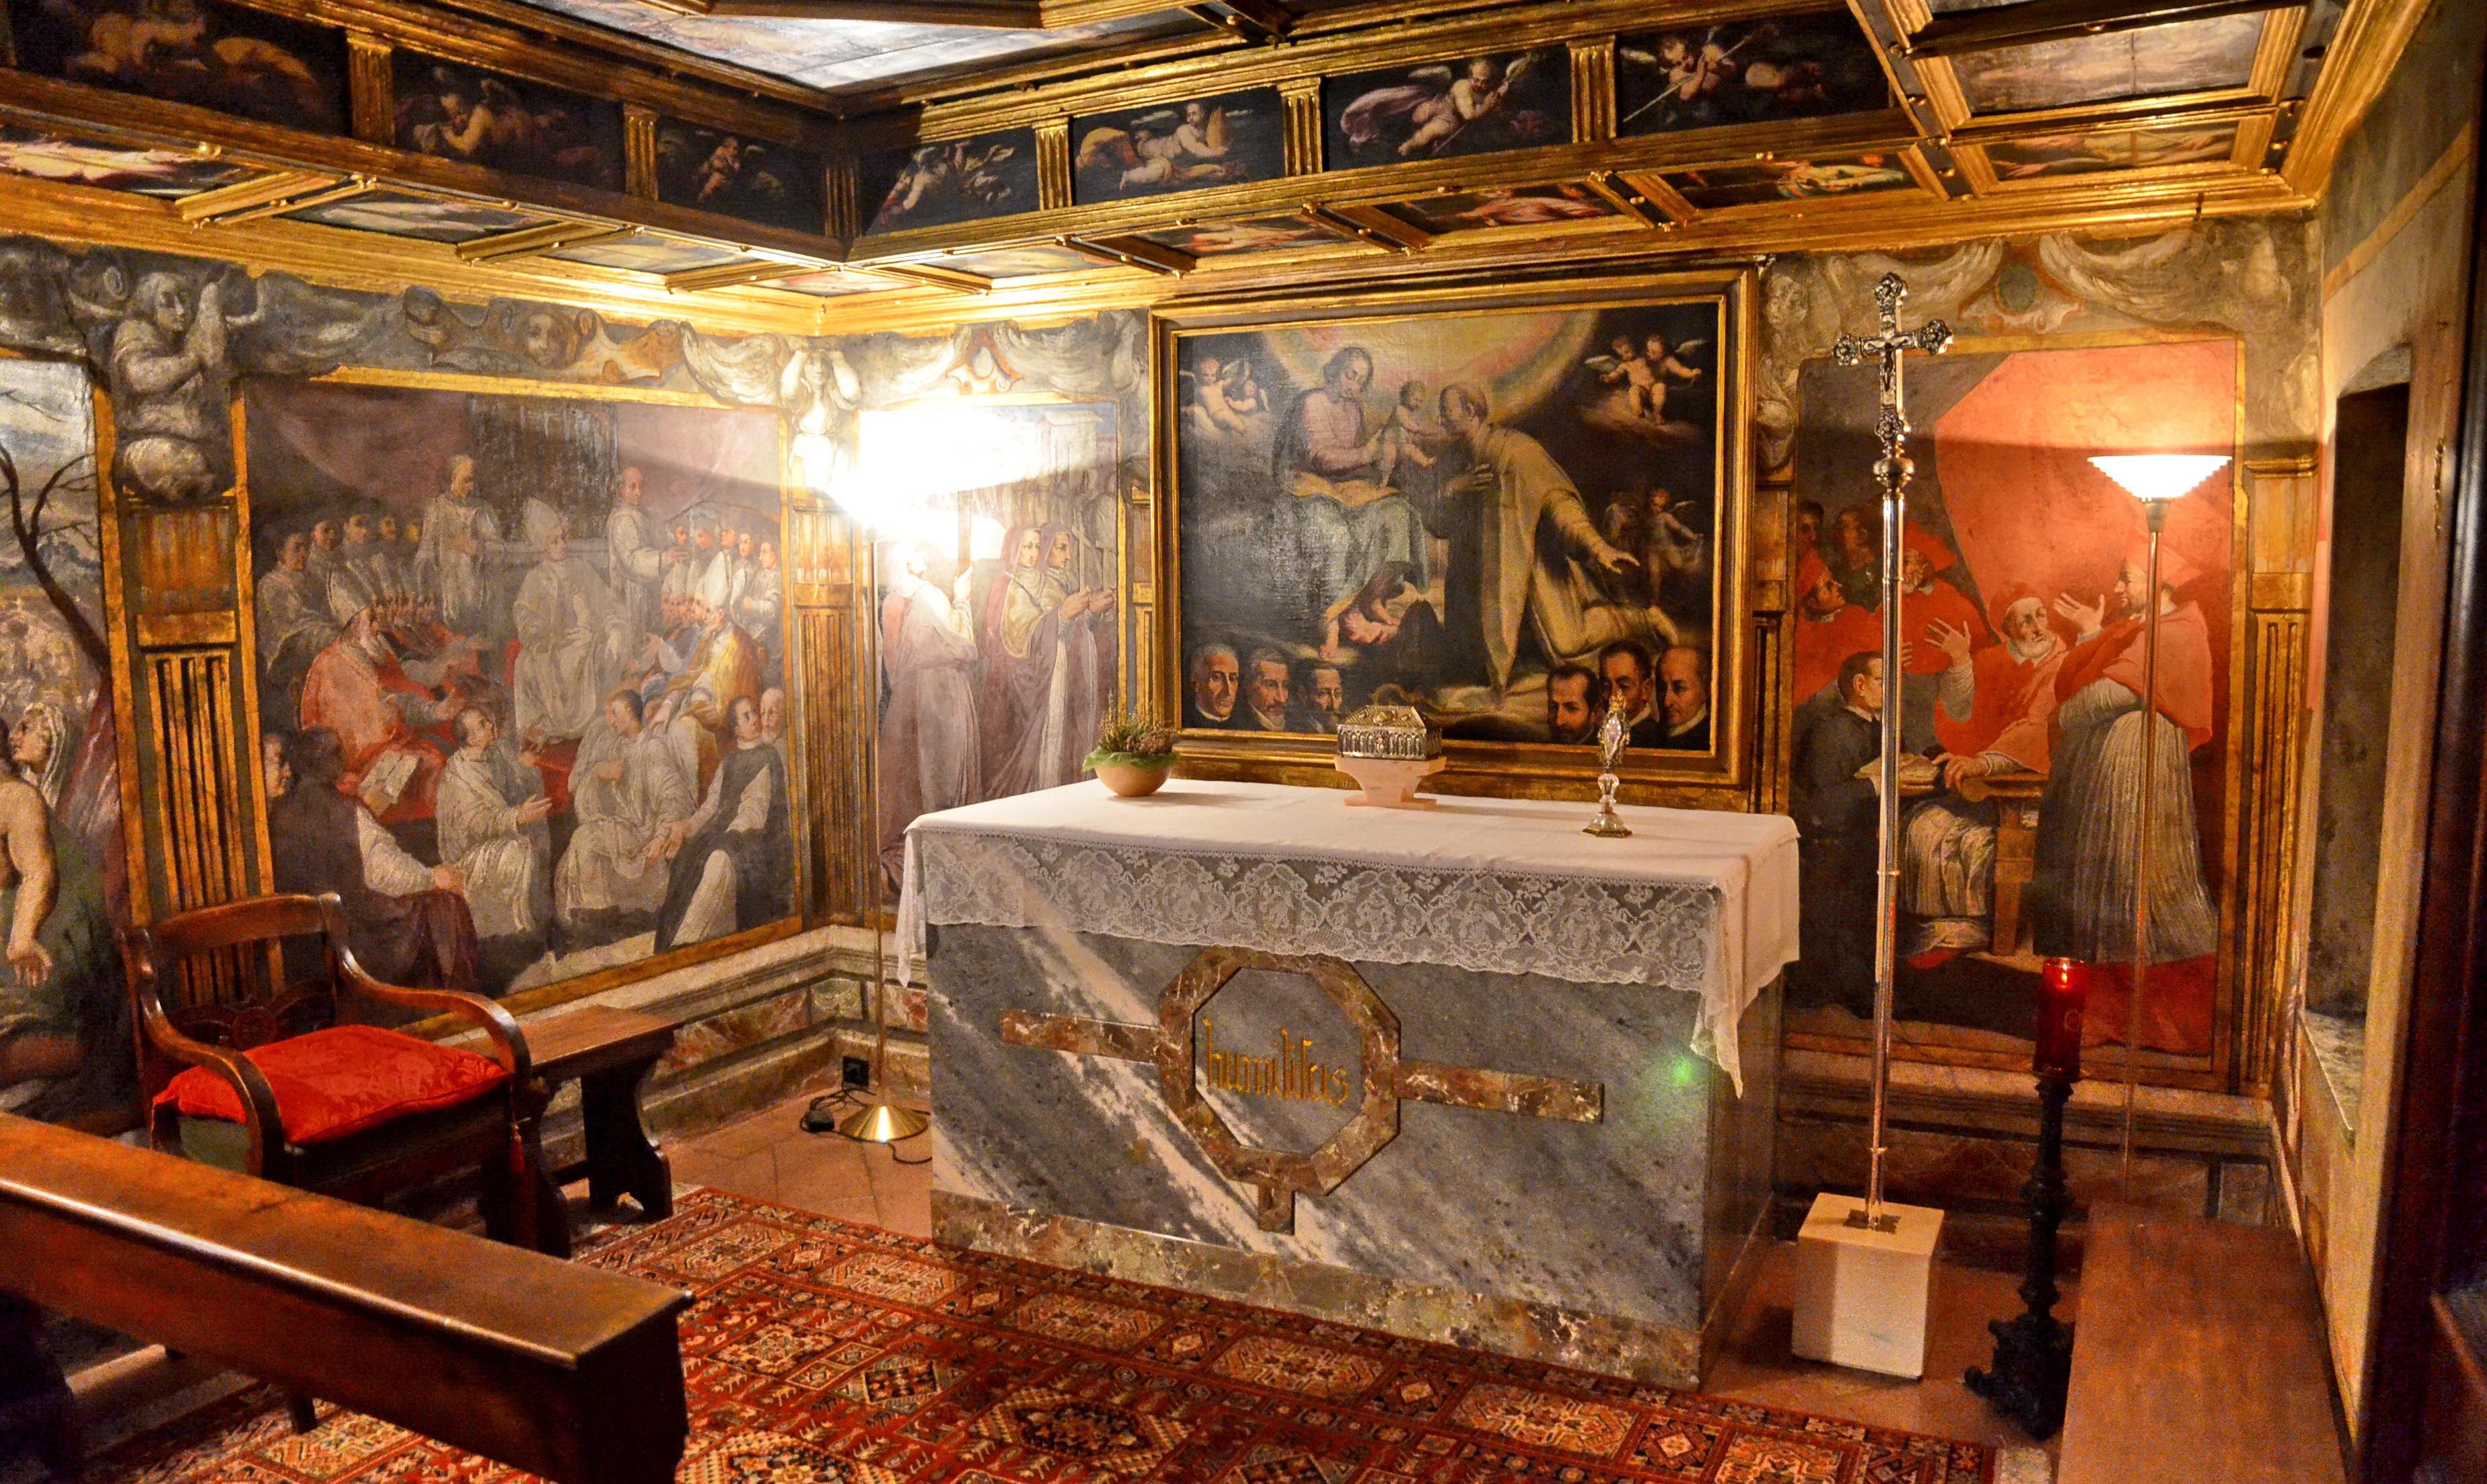 2020 Cappella San carlo